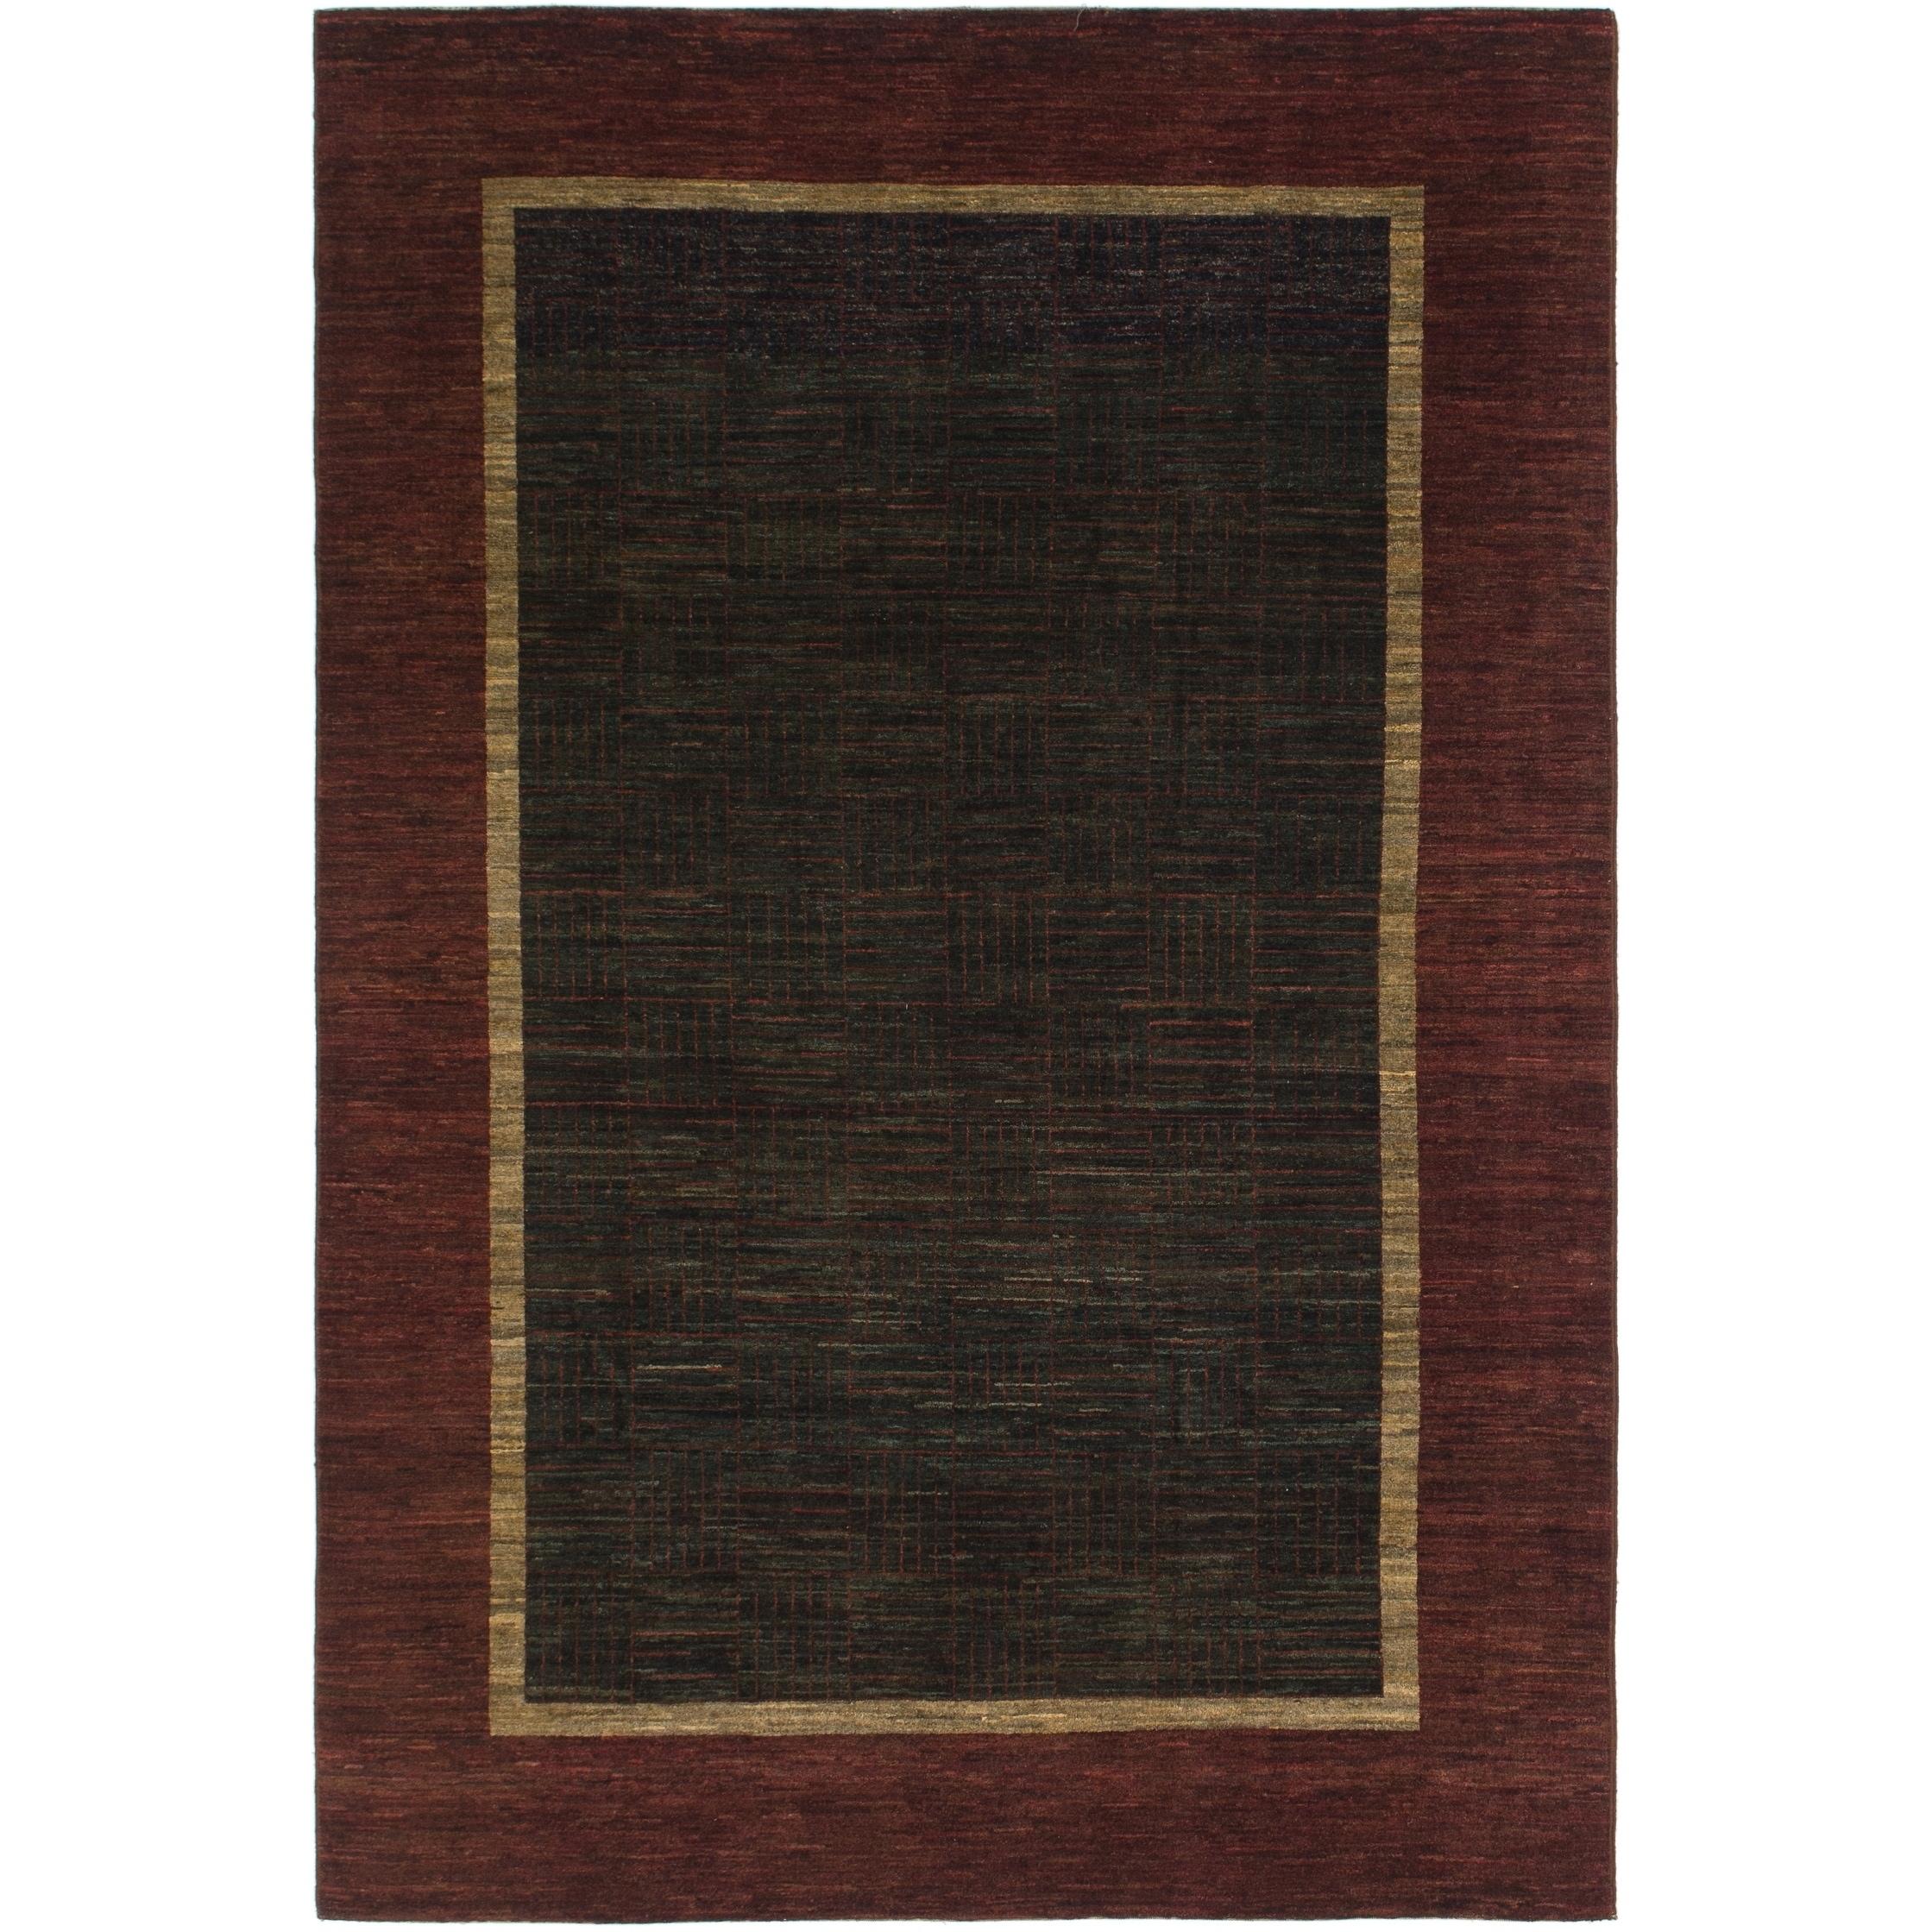 Hand Knotted Kashkuli Gabbeh Wool Area Rug - 6 6 x 9 8 (Navy blue - 6 6 x 9 8)